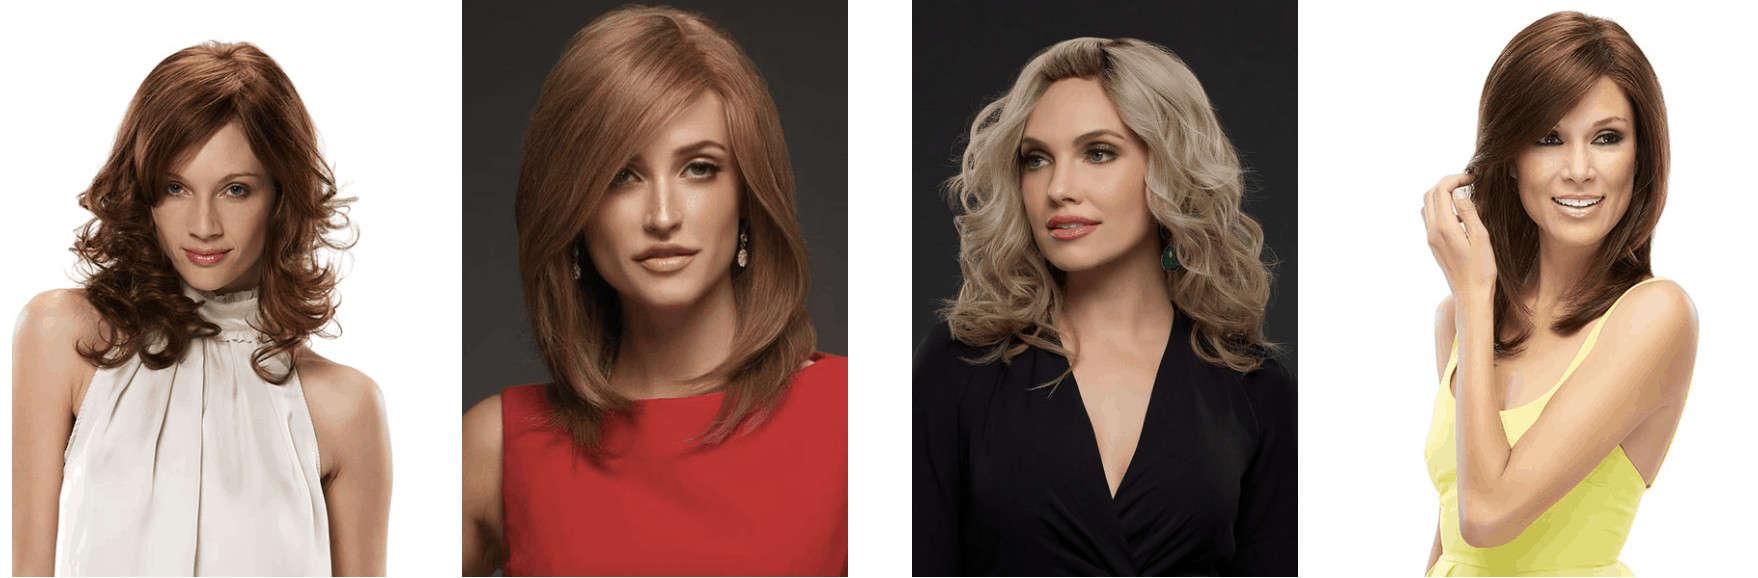 Layered Hair Wig Examples